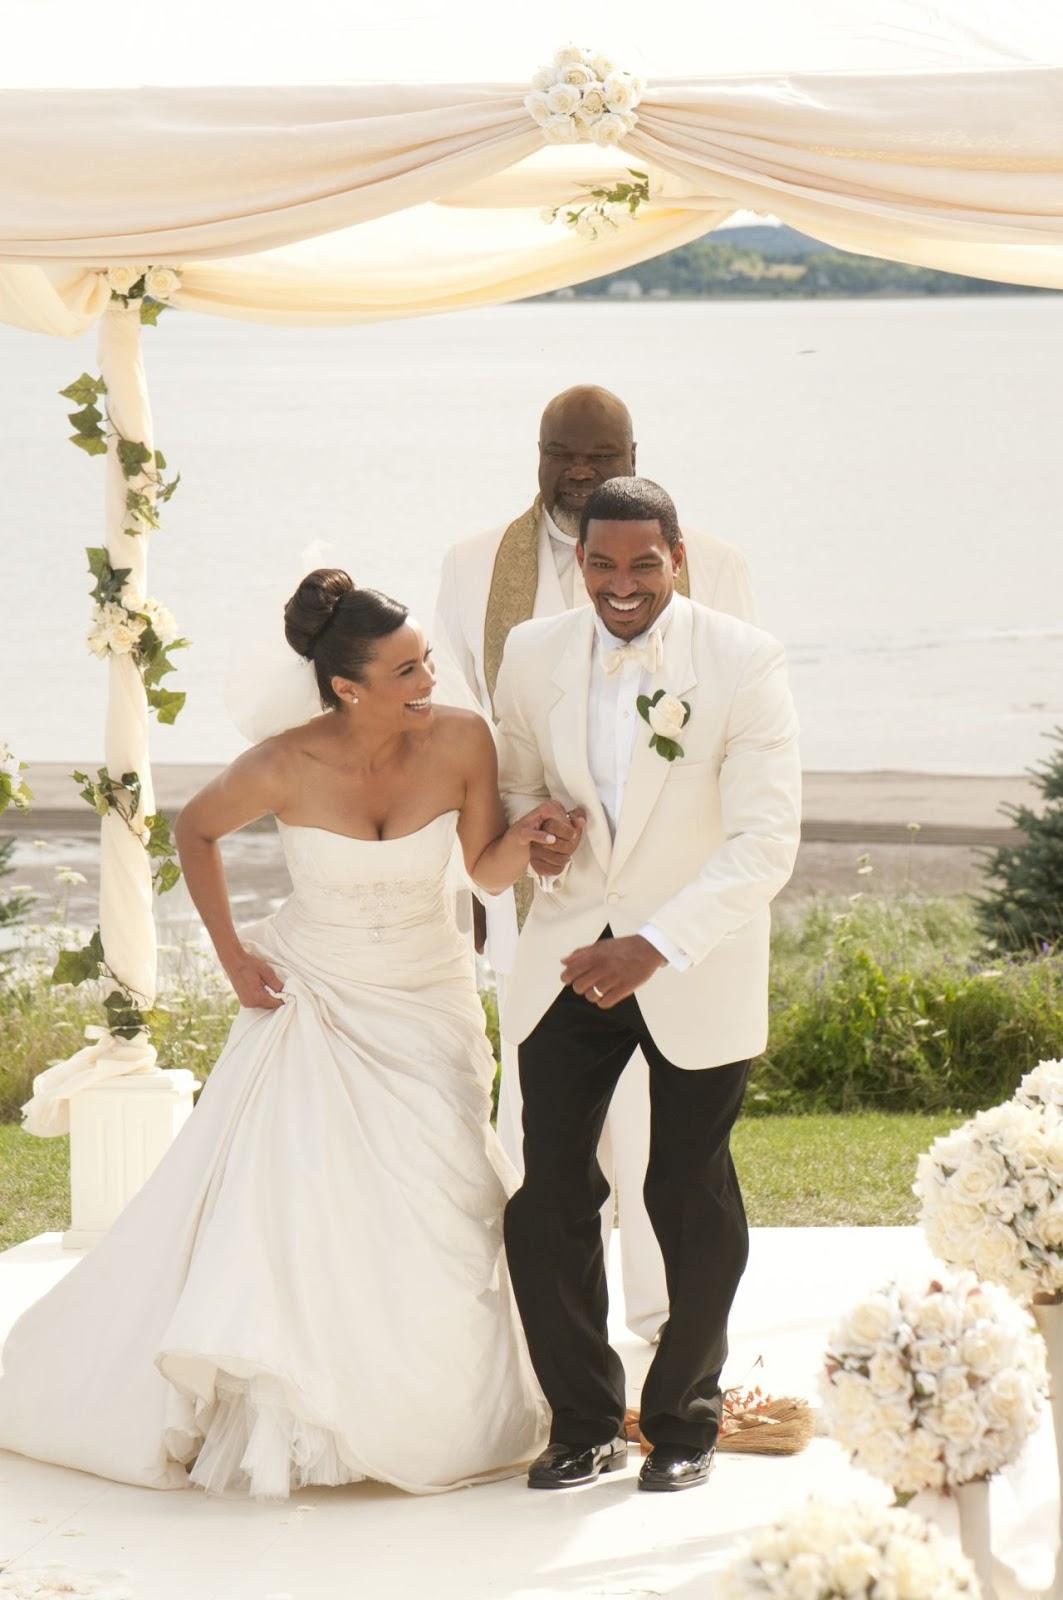 Wedding Week Jumping The Broom Addresses Racial Hangups While